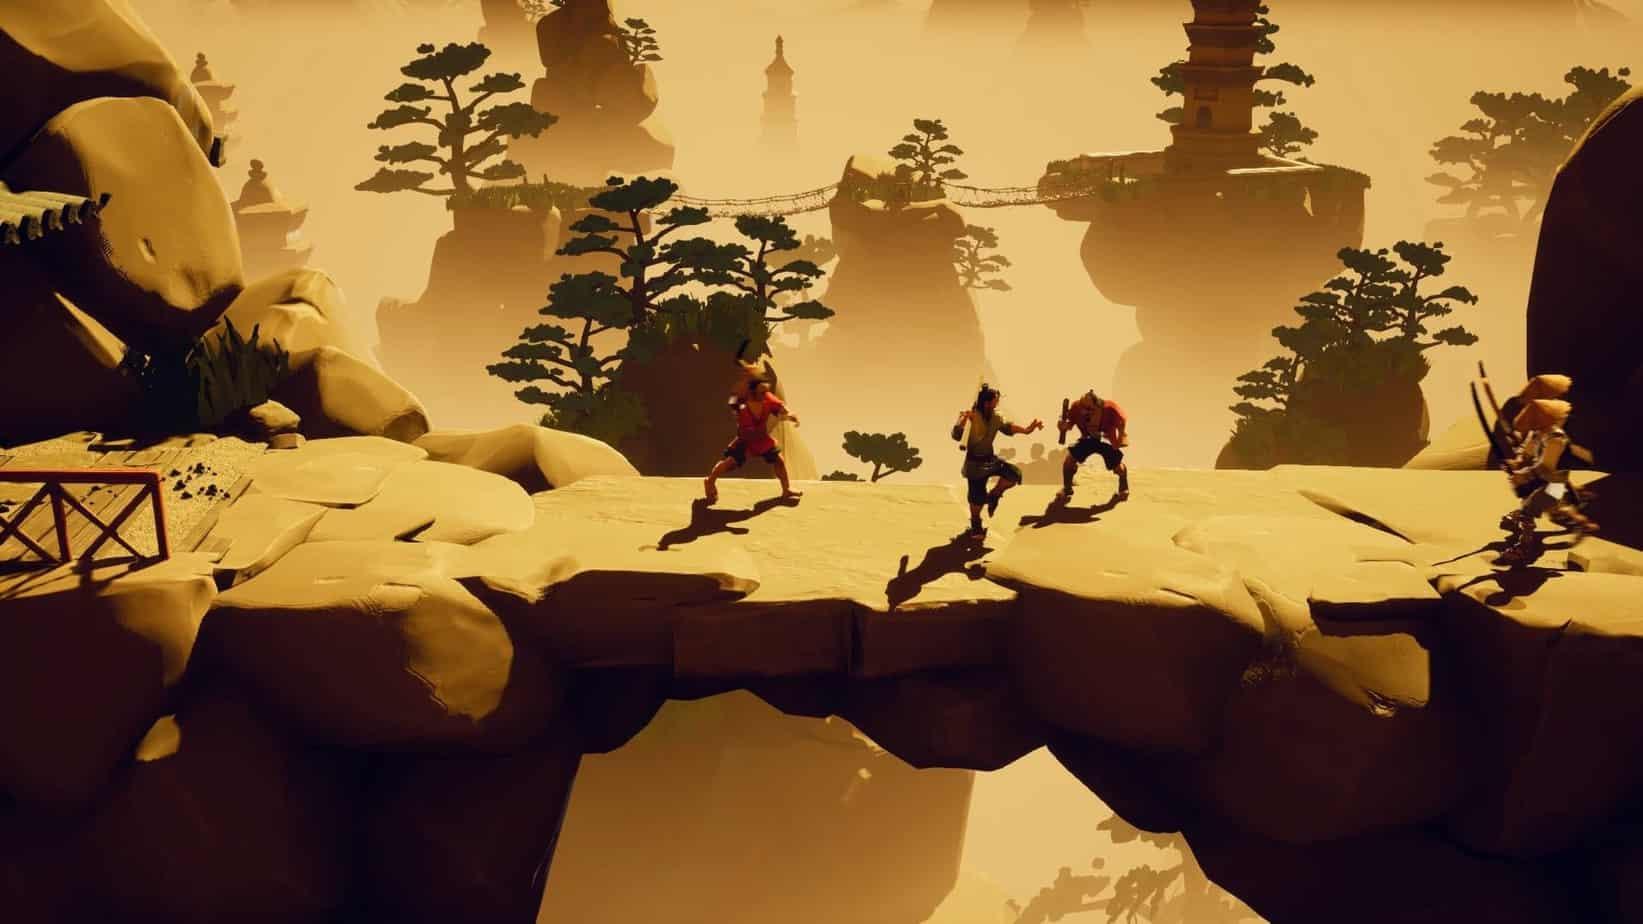 9 Monkeys of Shaolin механика игры